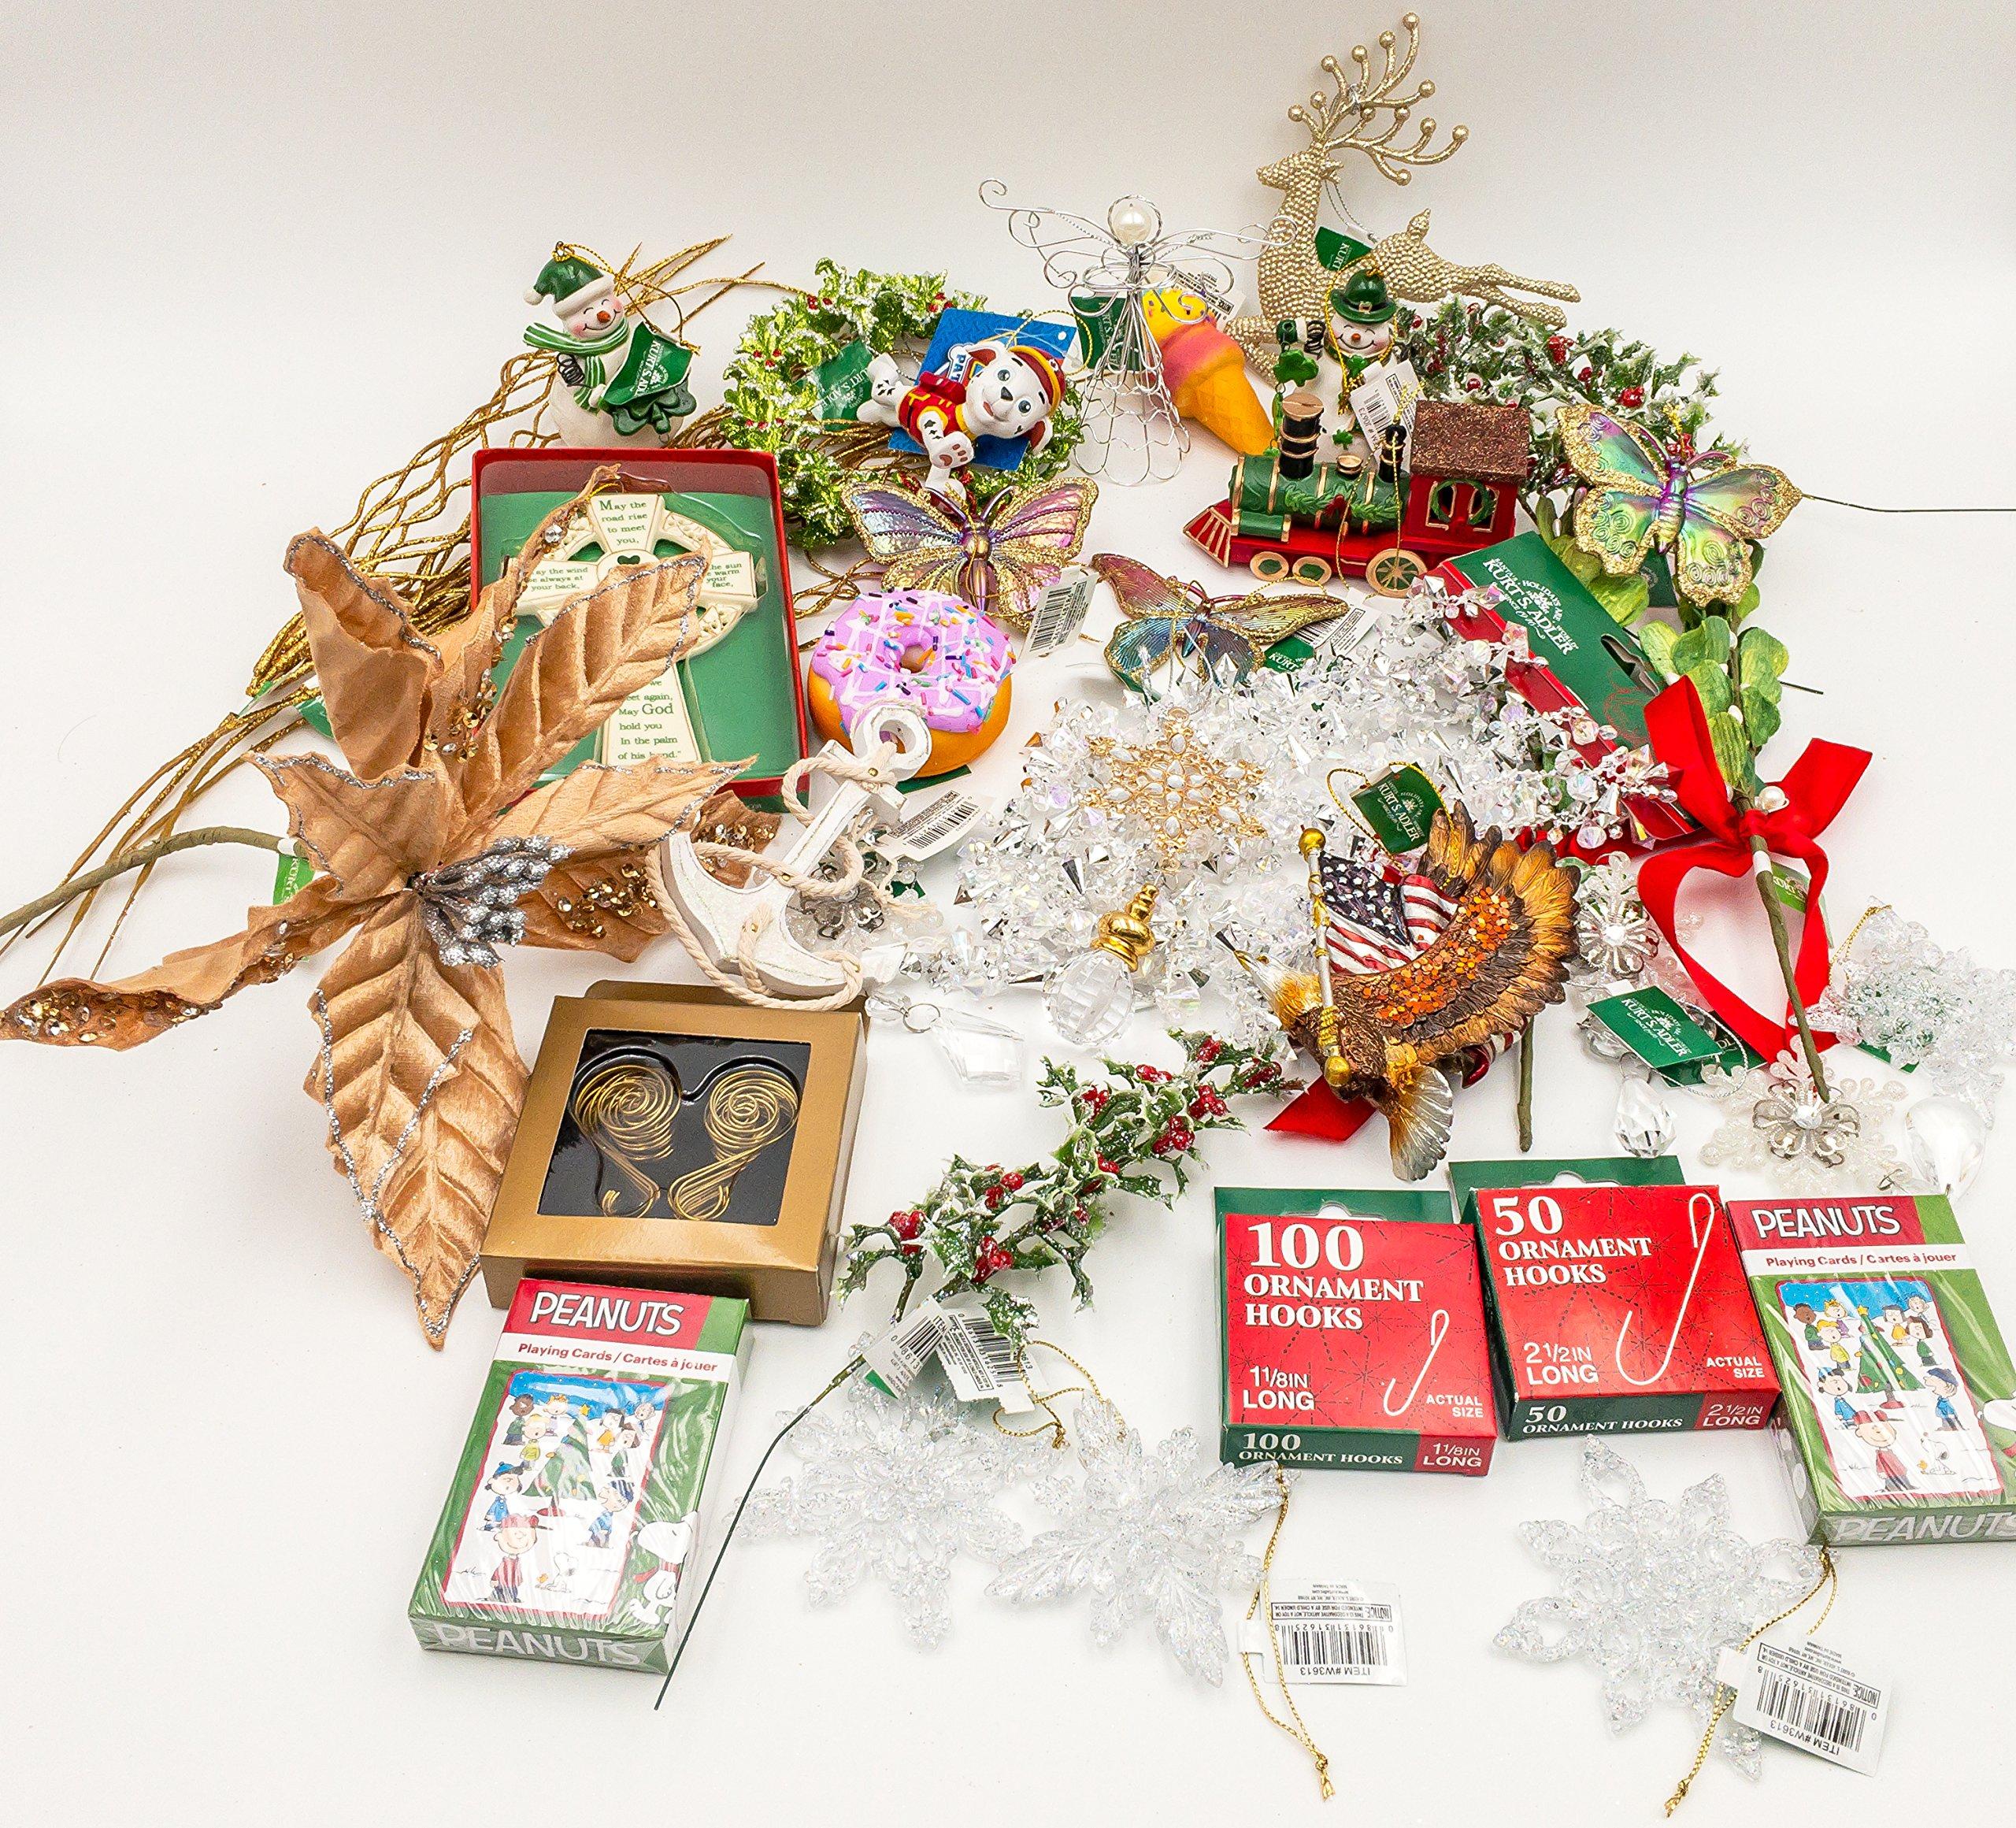 JZ Bundles Starter Set - Best of Christmas Option C - Kurt Adler - 37-Piece Bundle - A Bundle of Christmas Ornaments Great Gift